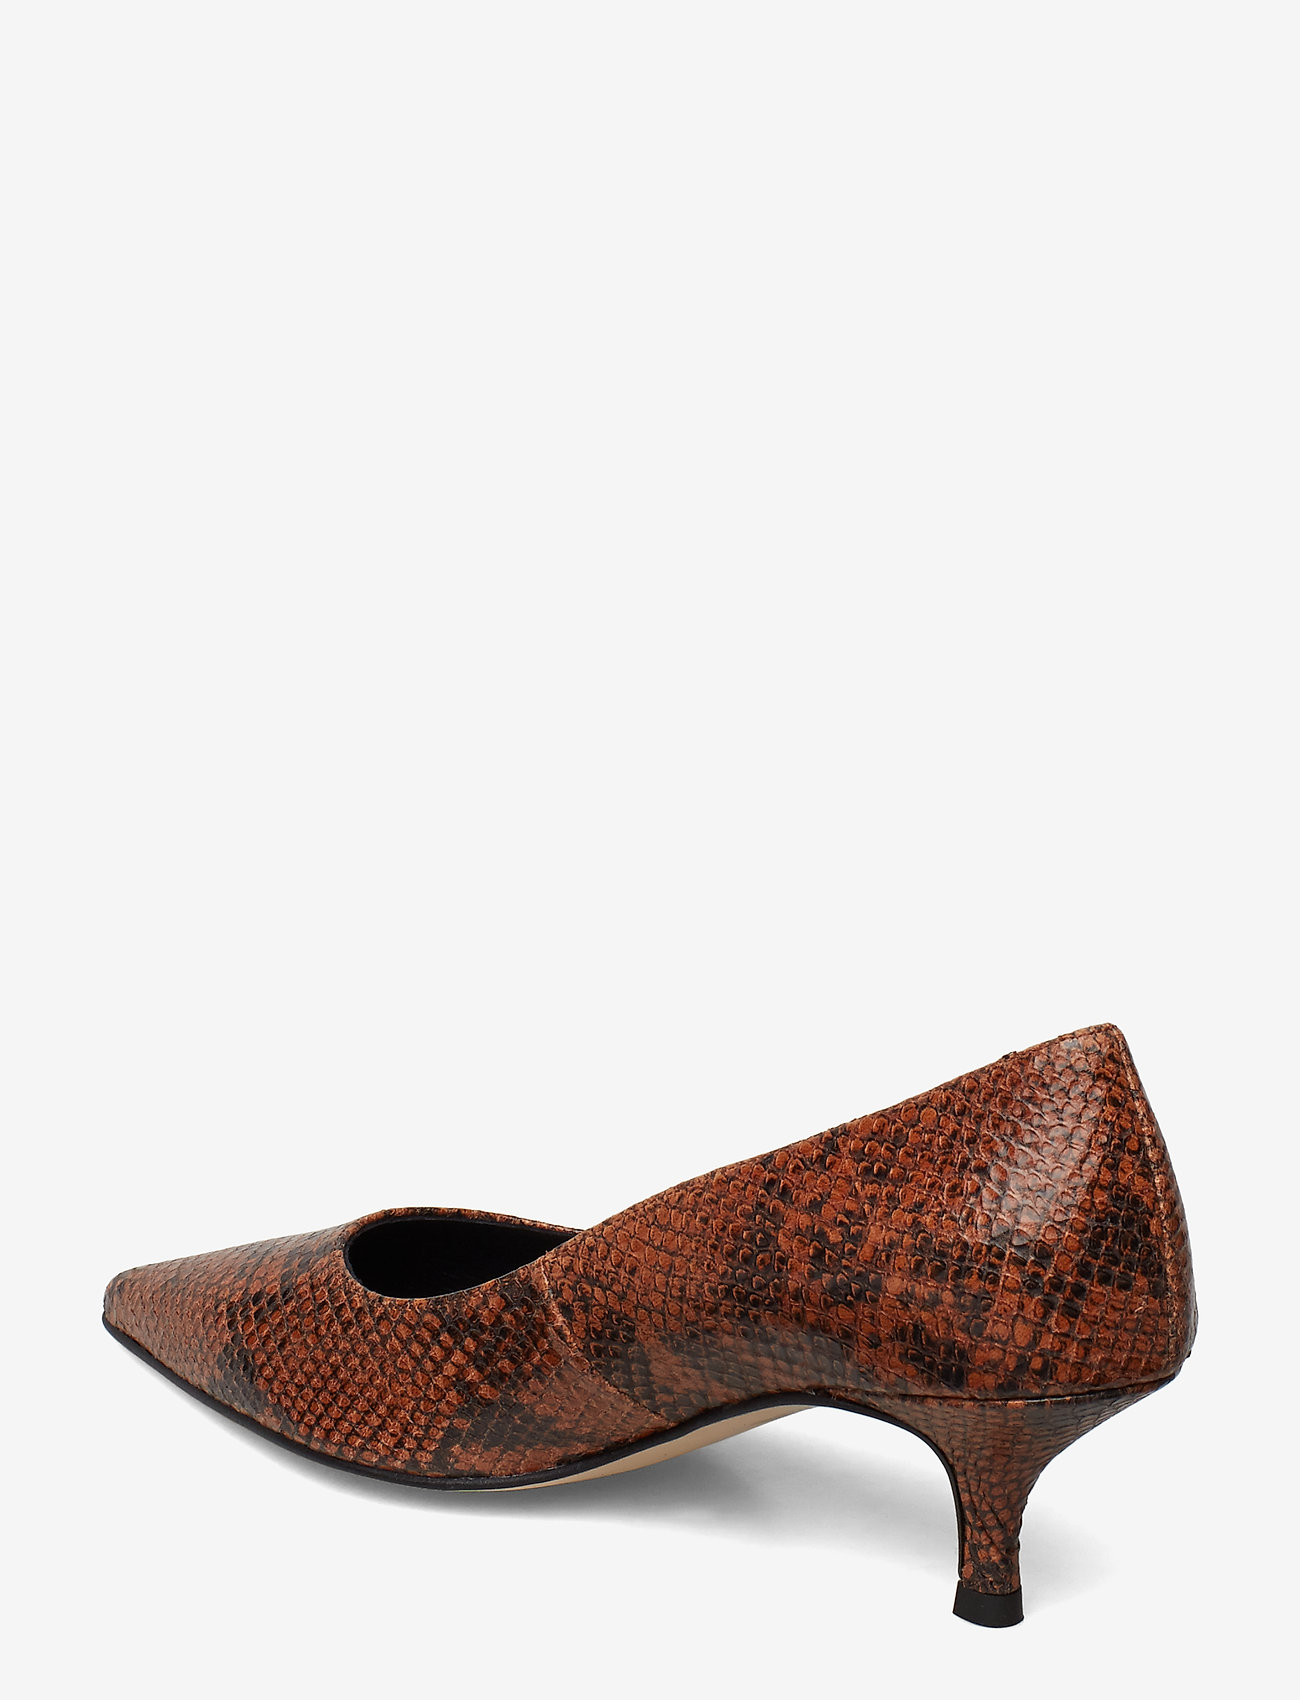 Hayden Snake (Brown) (599.40 kr) - Shoe The Bear